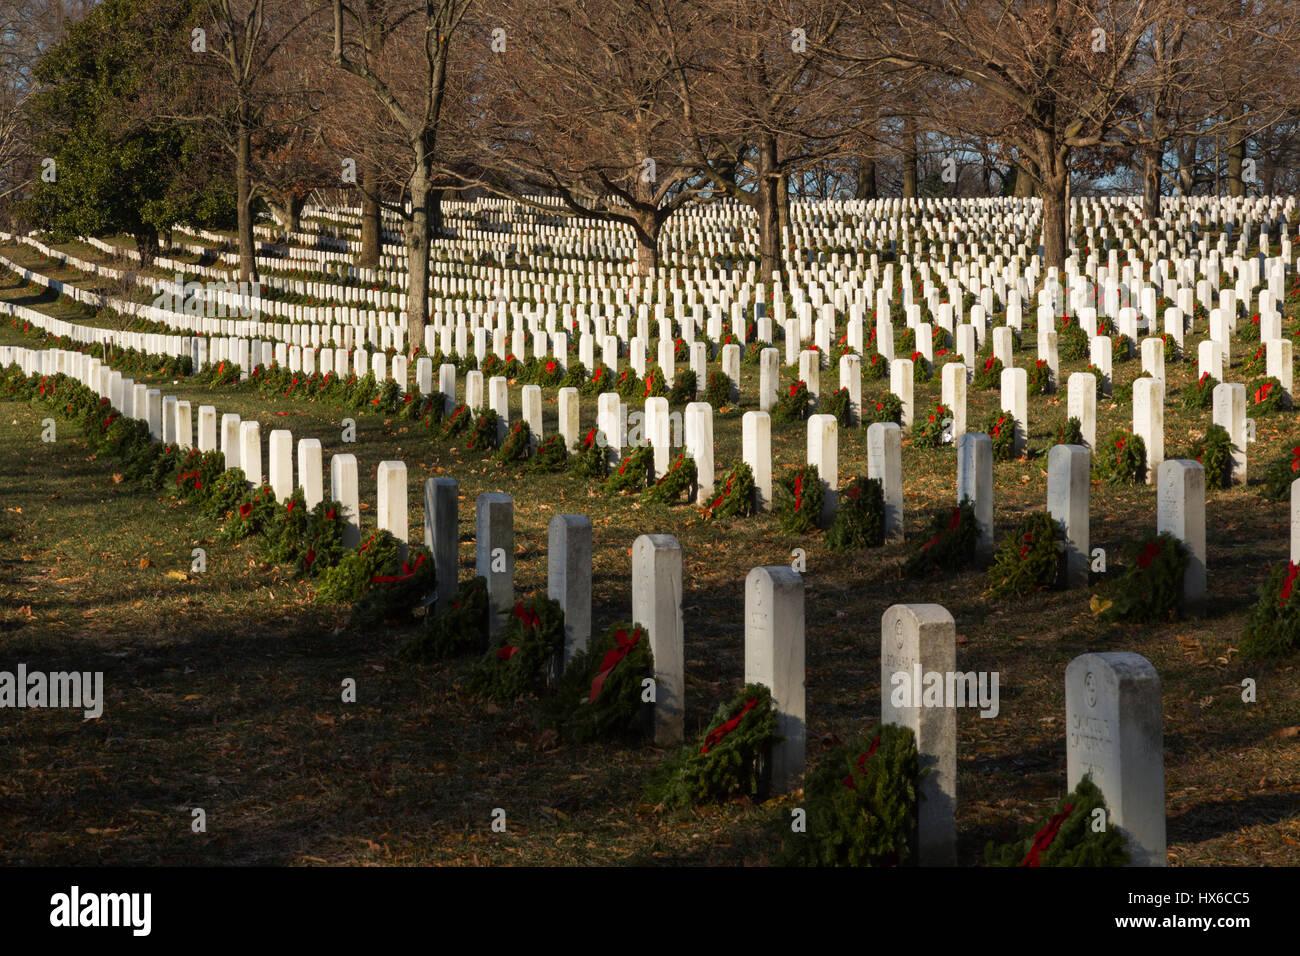 Gravesites at Arlington National Cemetery decorated with Christmas Wreaths, Arlington, VA, USA - Stock Image